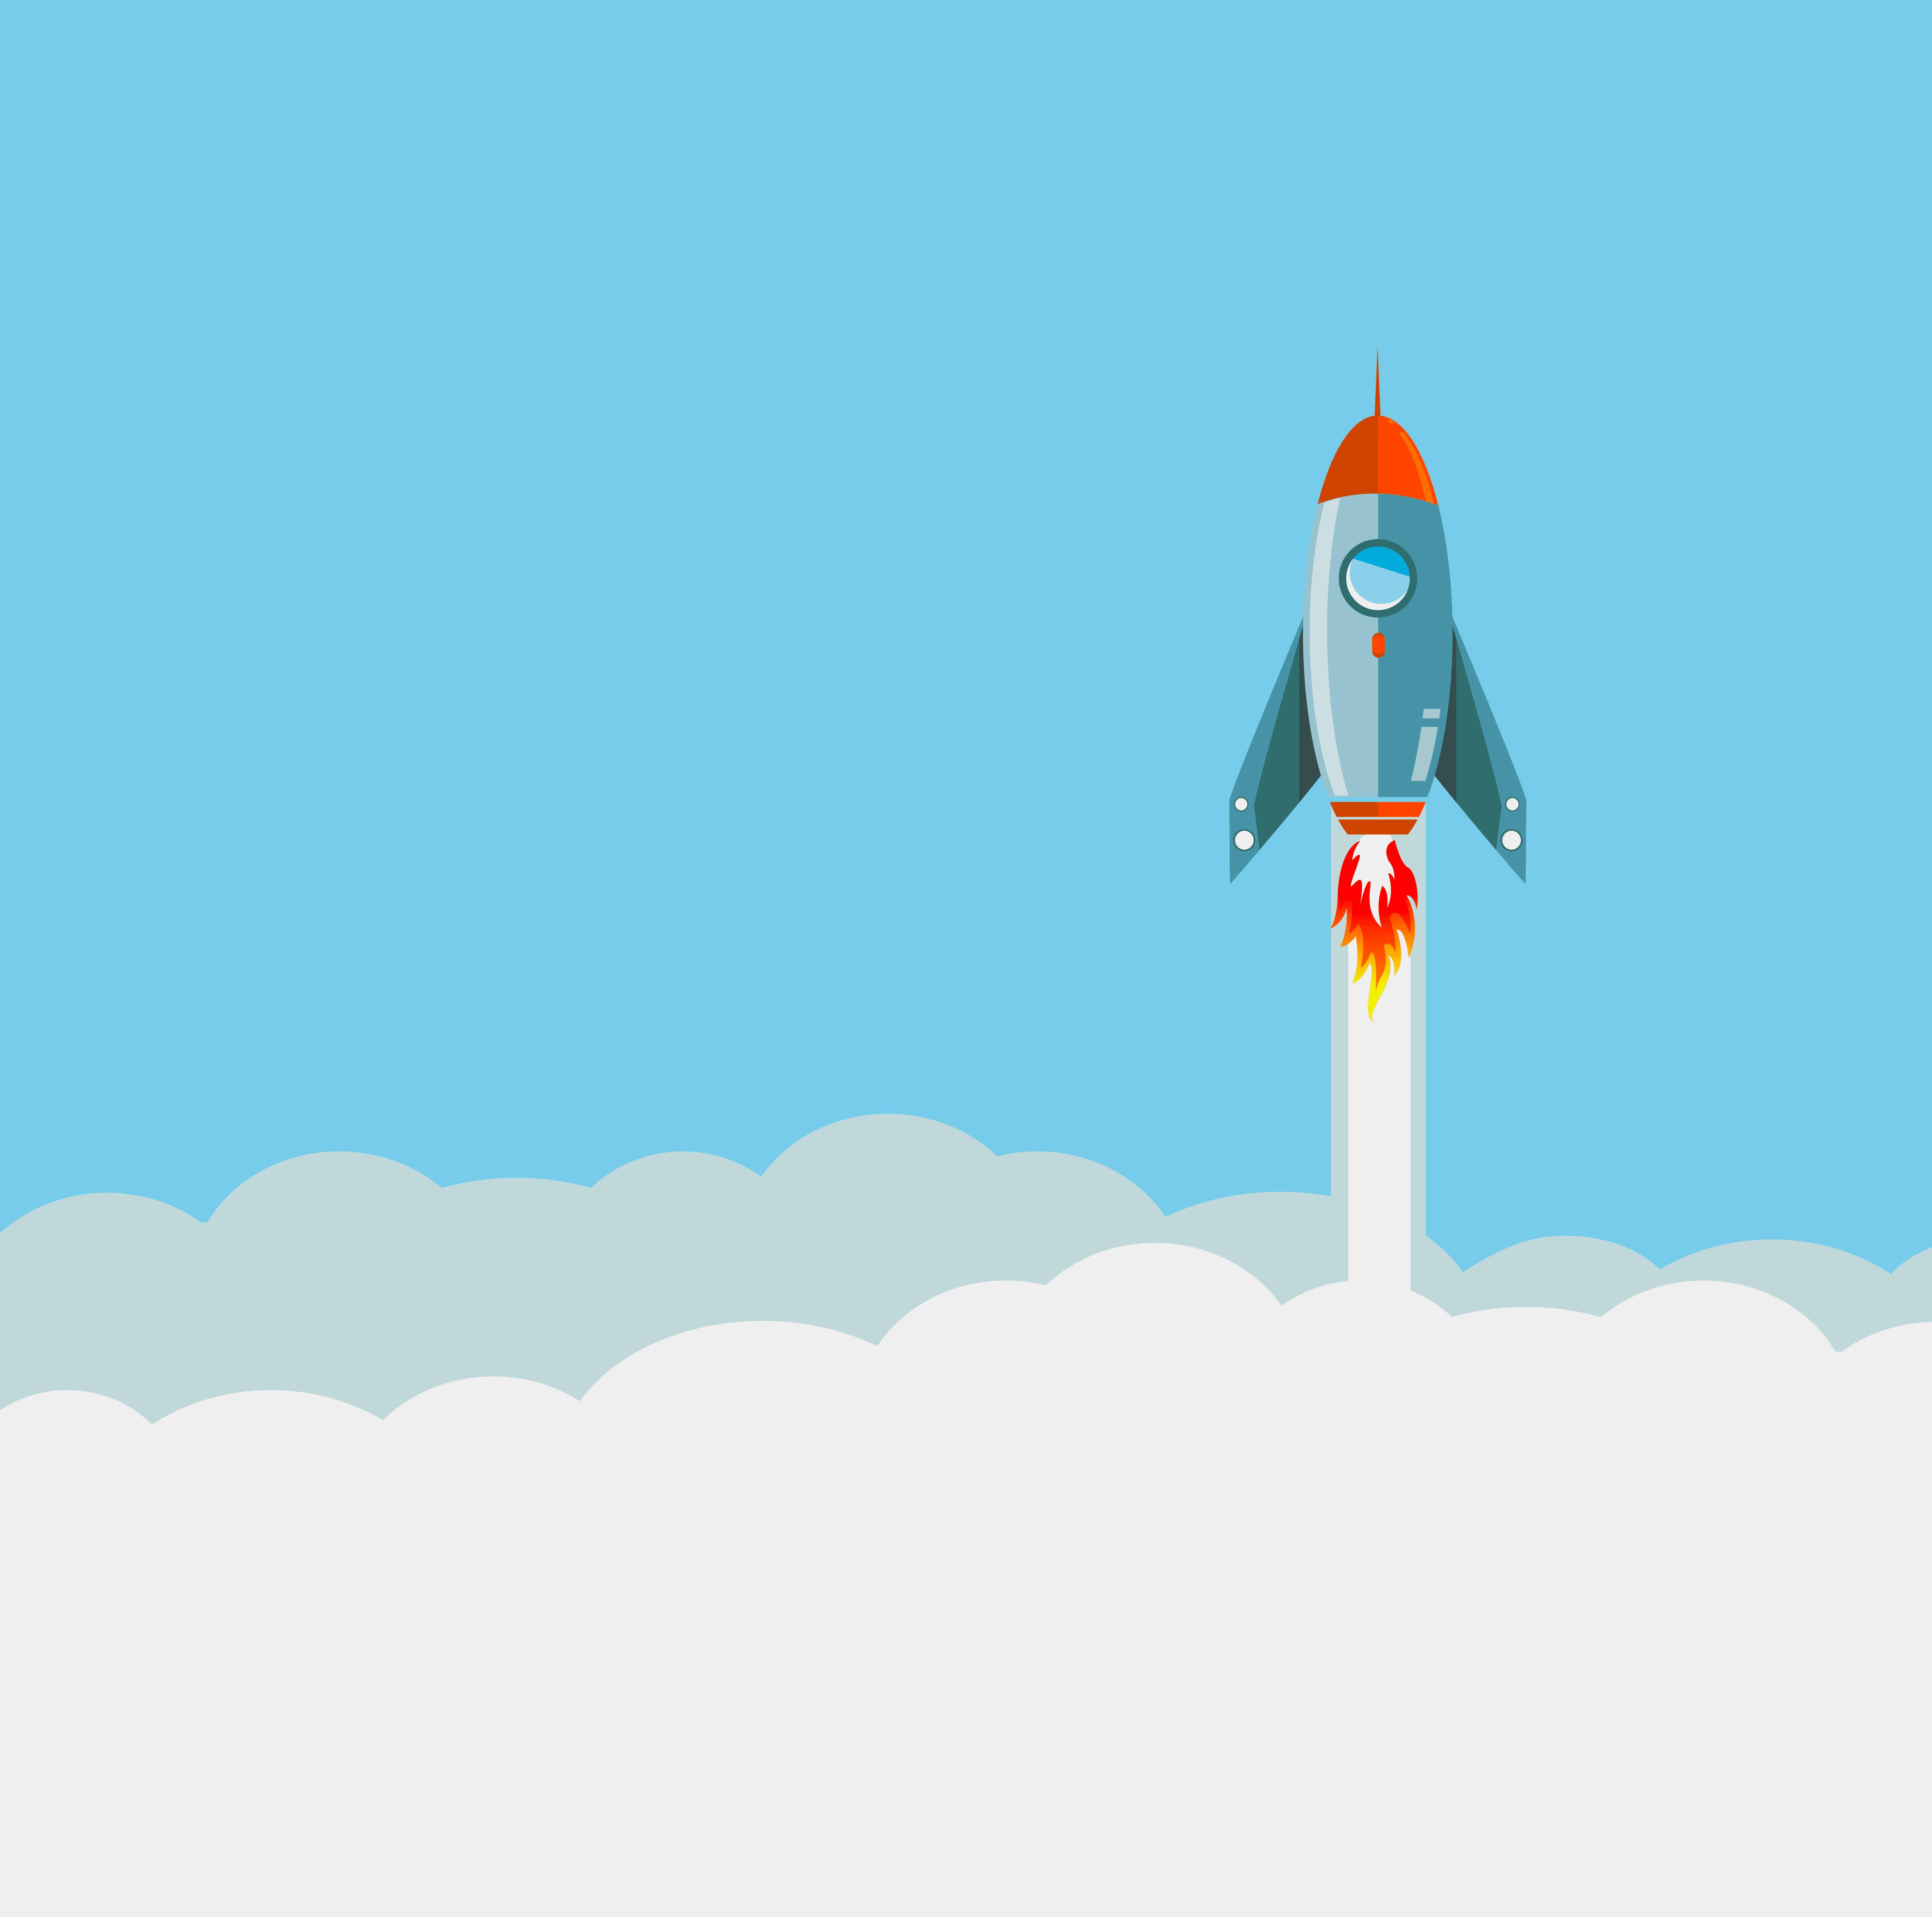 rocket-launch-bright-sm